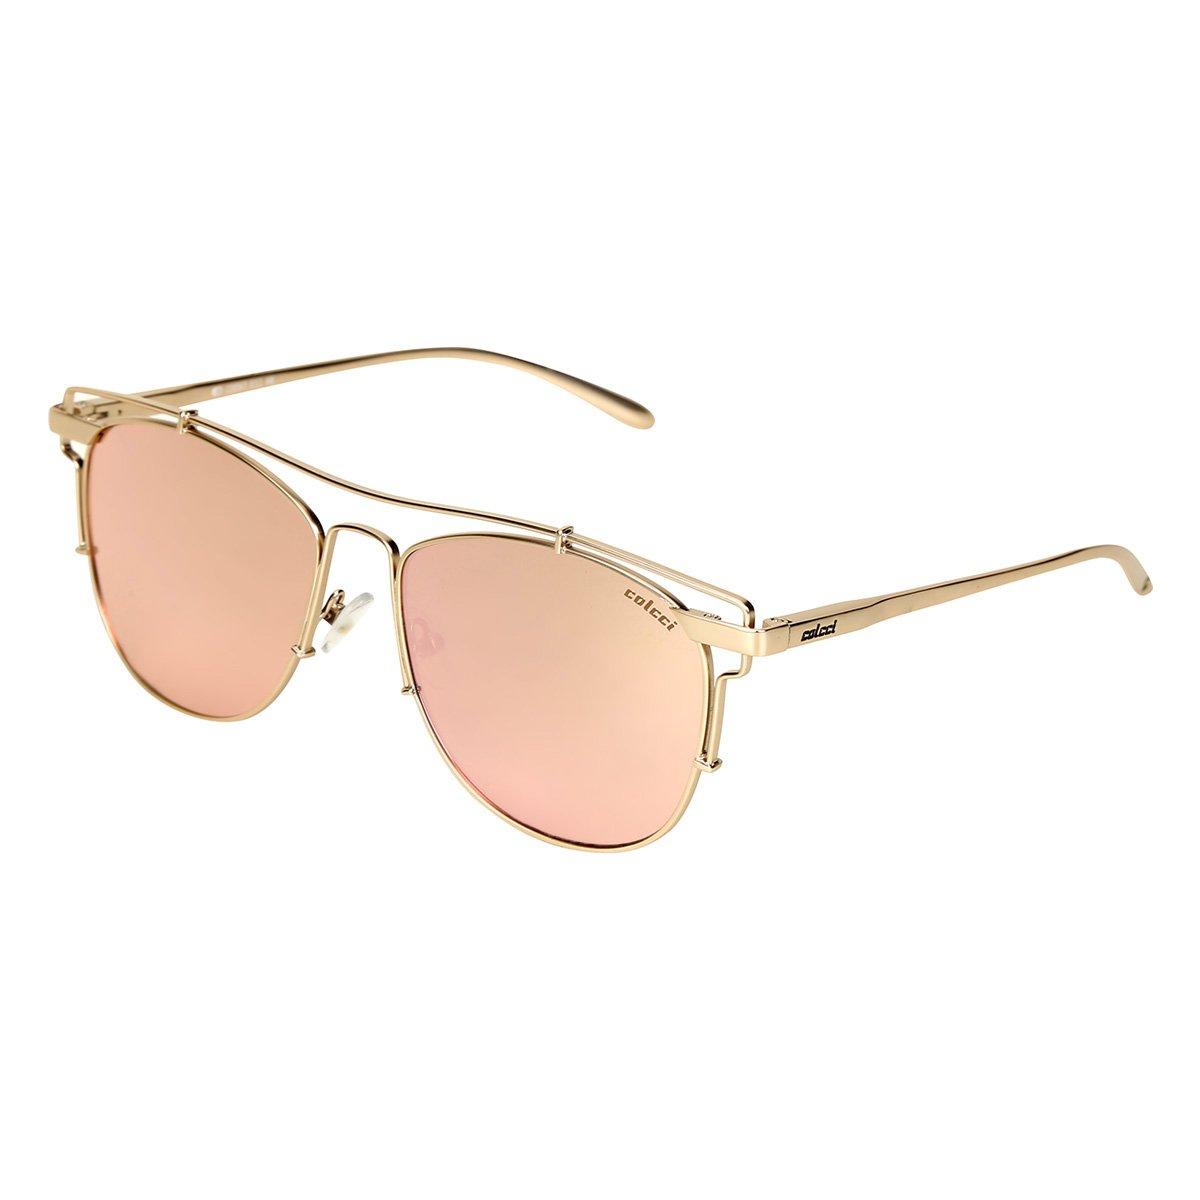 ba5954179ce55 Óculos de Sol Colcci Revo Rose Gold Feminino - Compre Agora   Netshoes